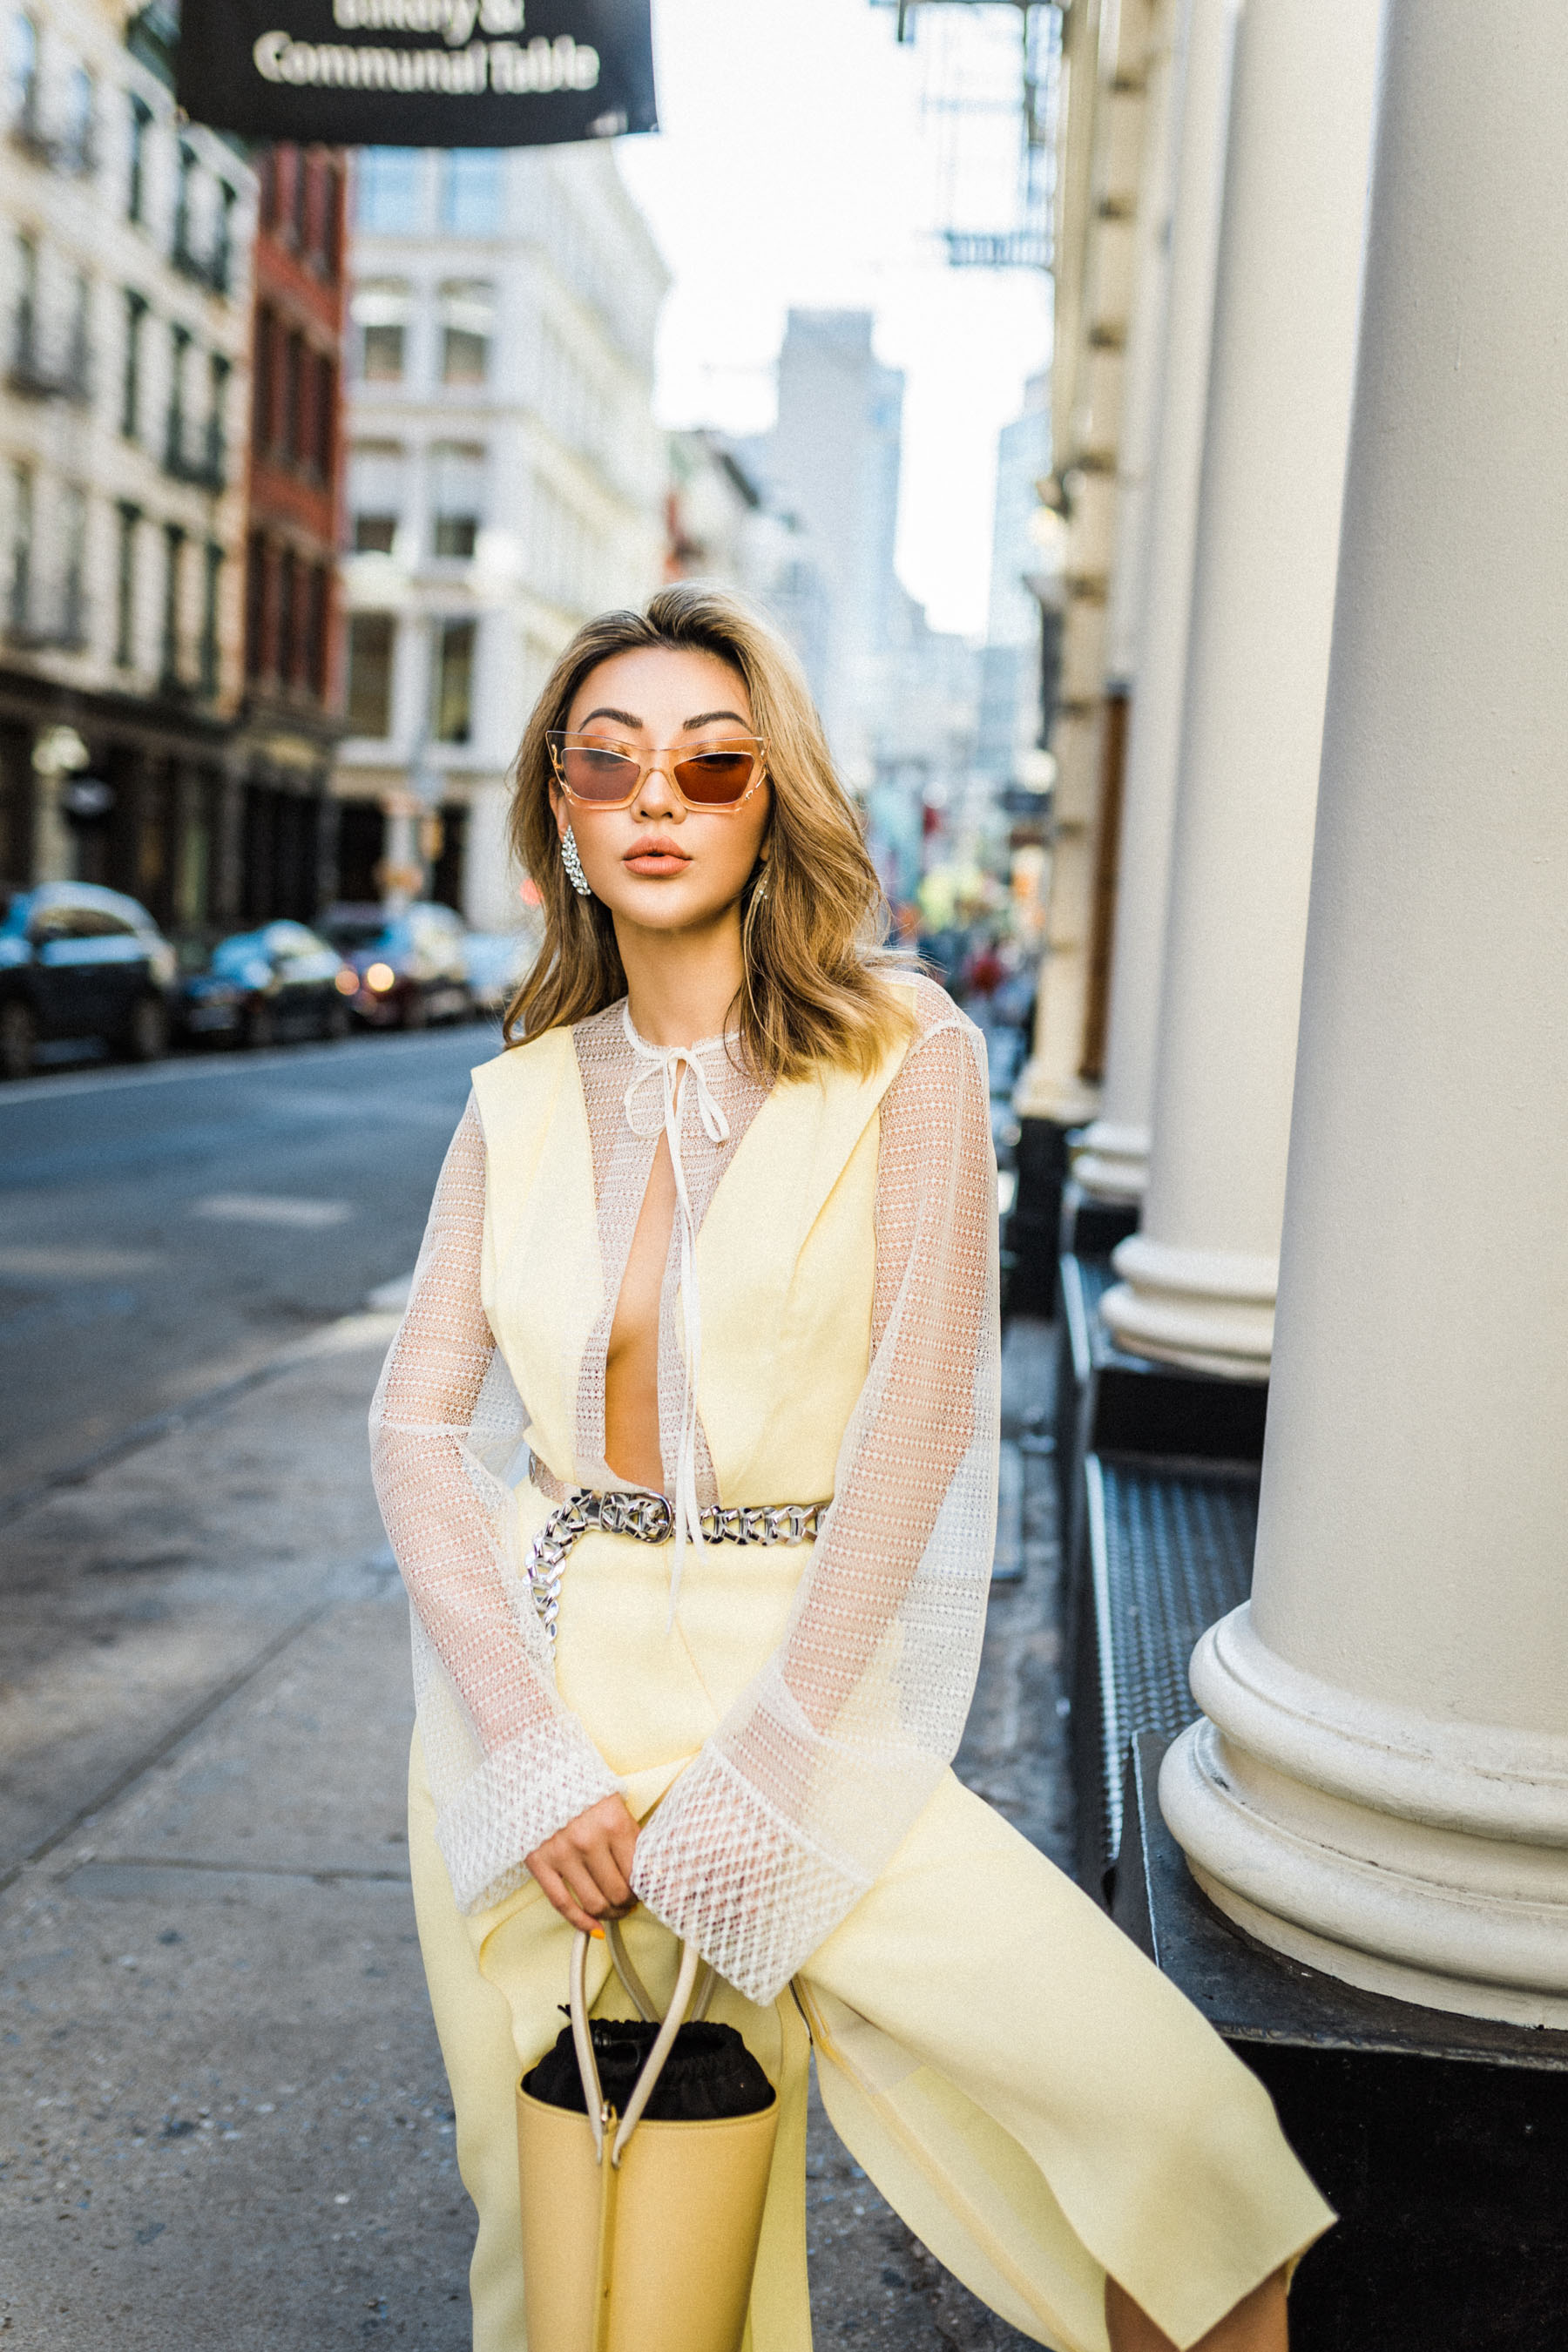 sheer fashion trend, sheer yellow dress, white slingback pumps // Notjessfashion.com